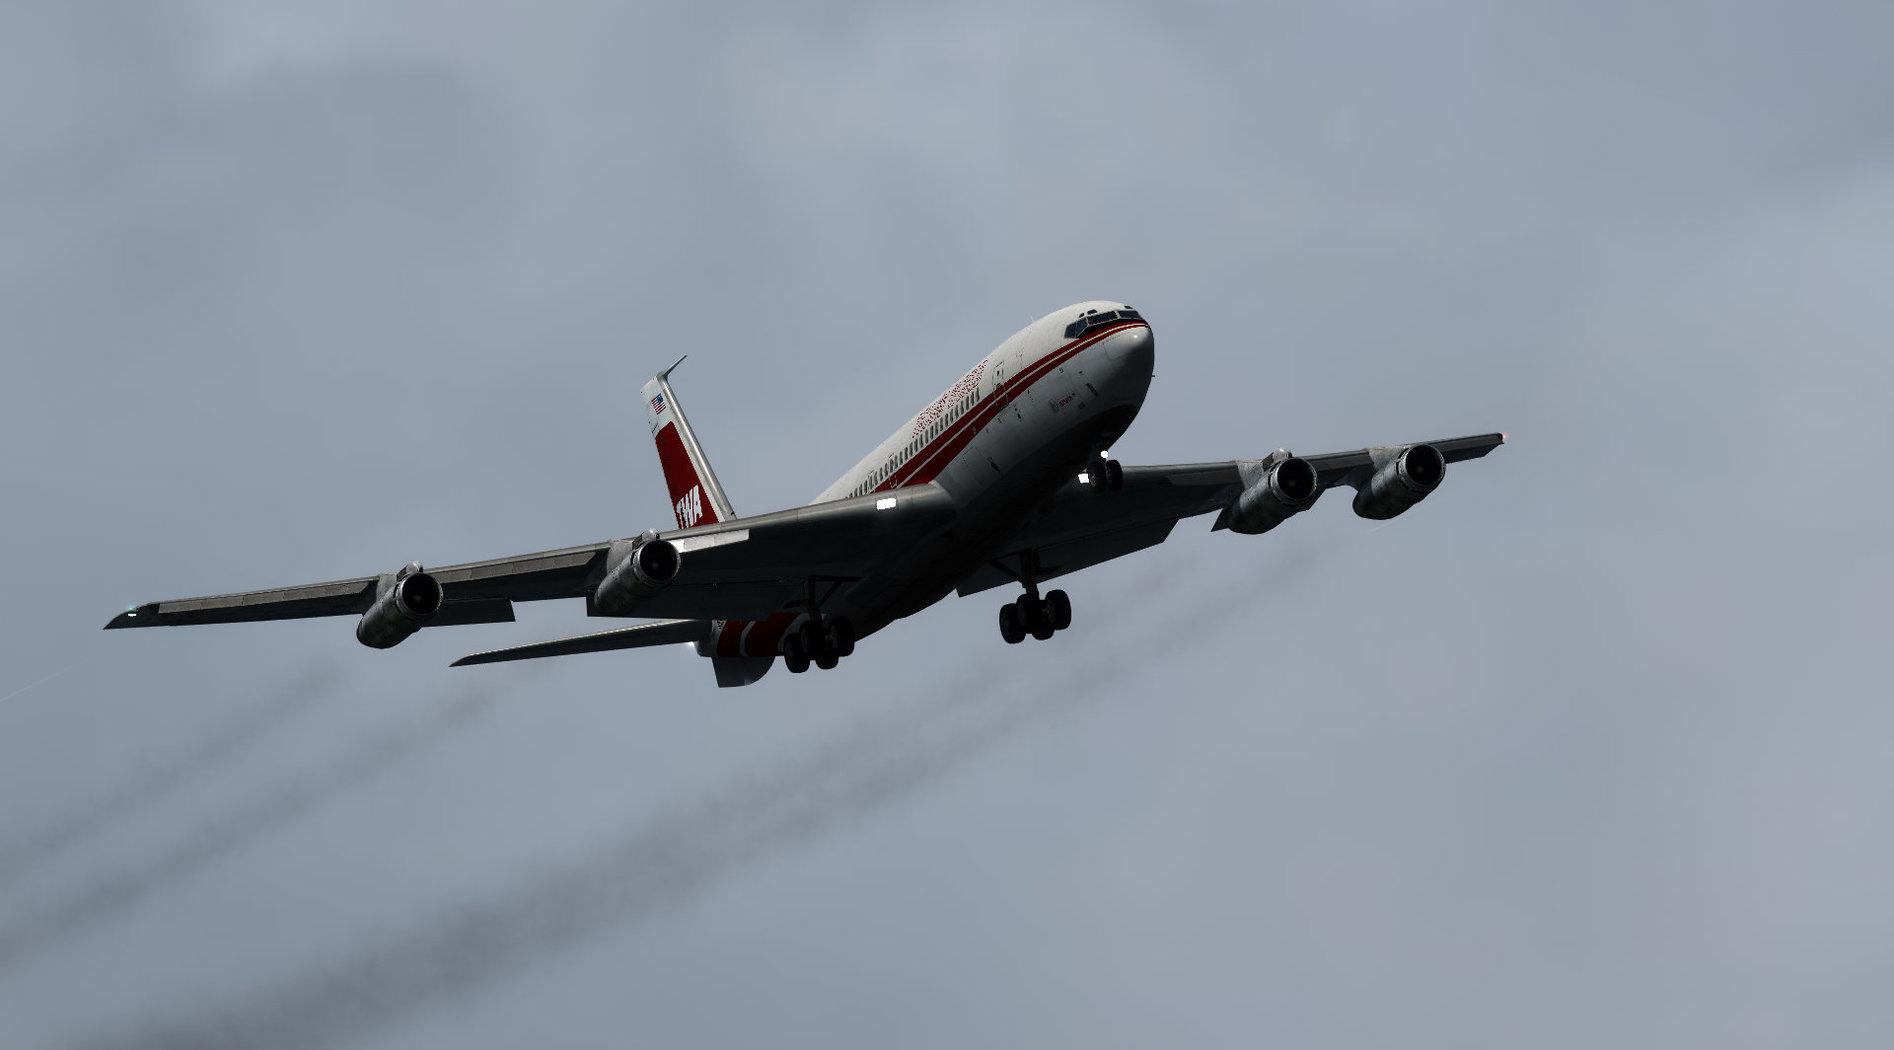 B-707-320B - 2.jpg